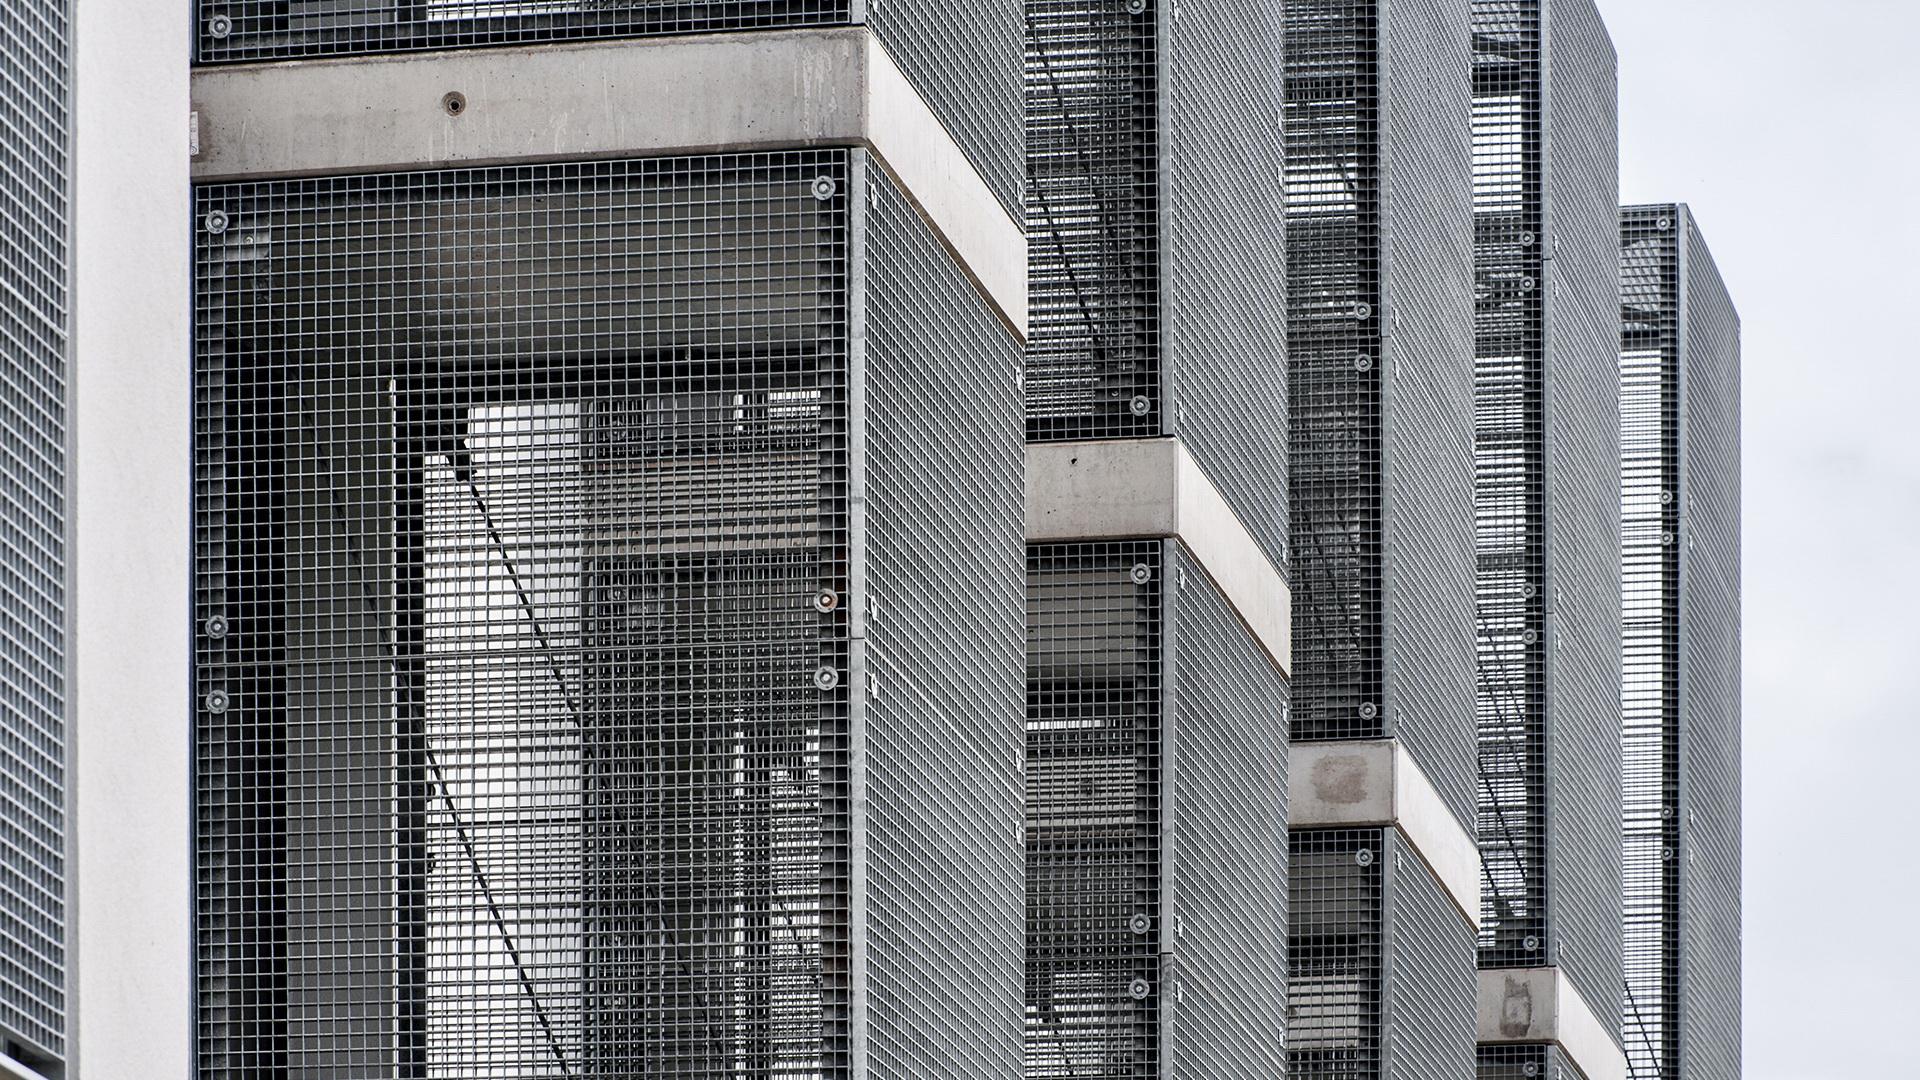 POLICE building - POLICE building